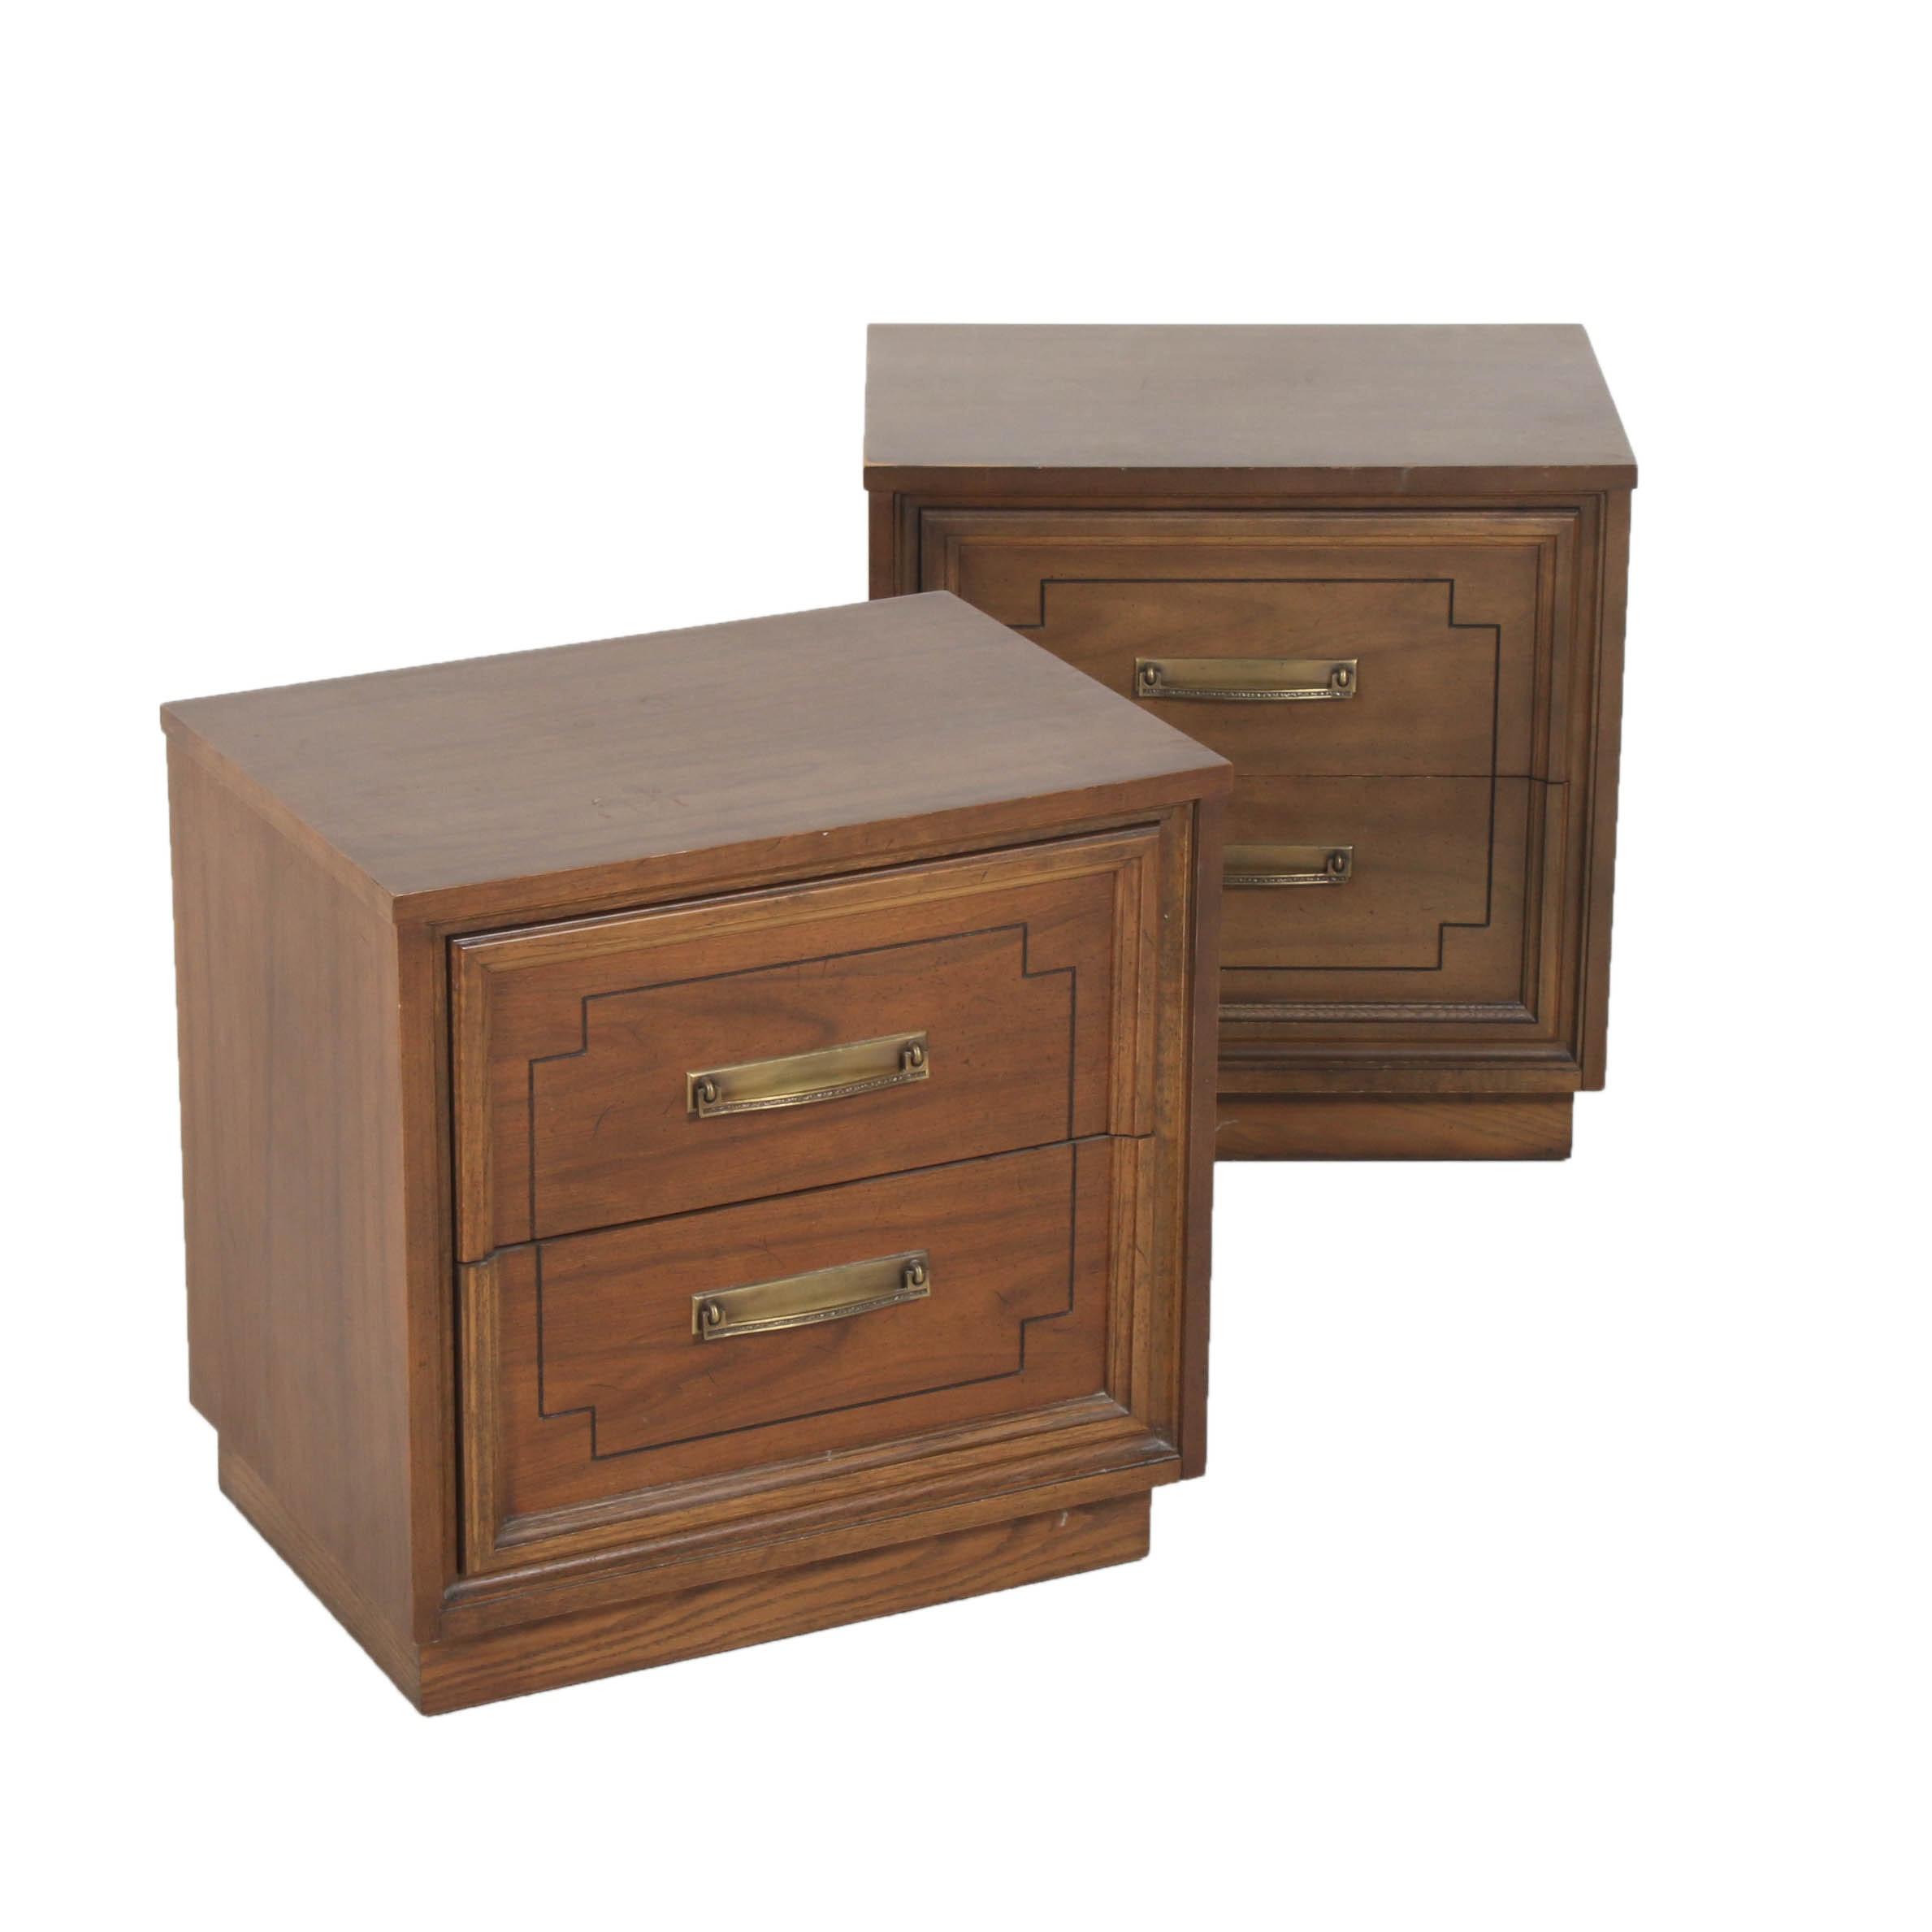 Vintage Dixie Furniture Wooden Nightstands